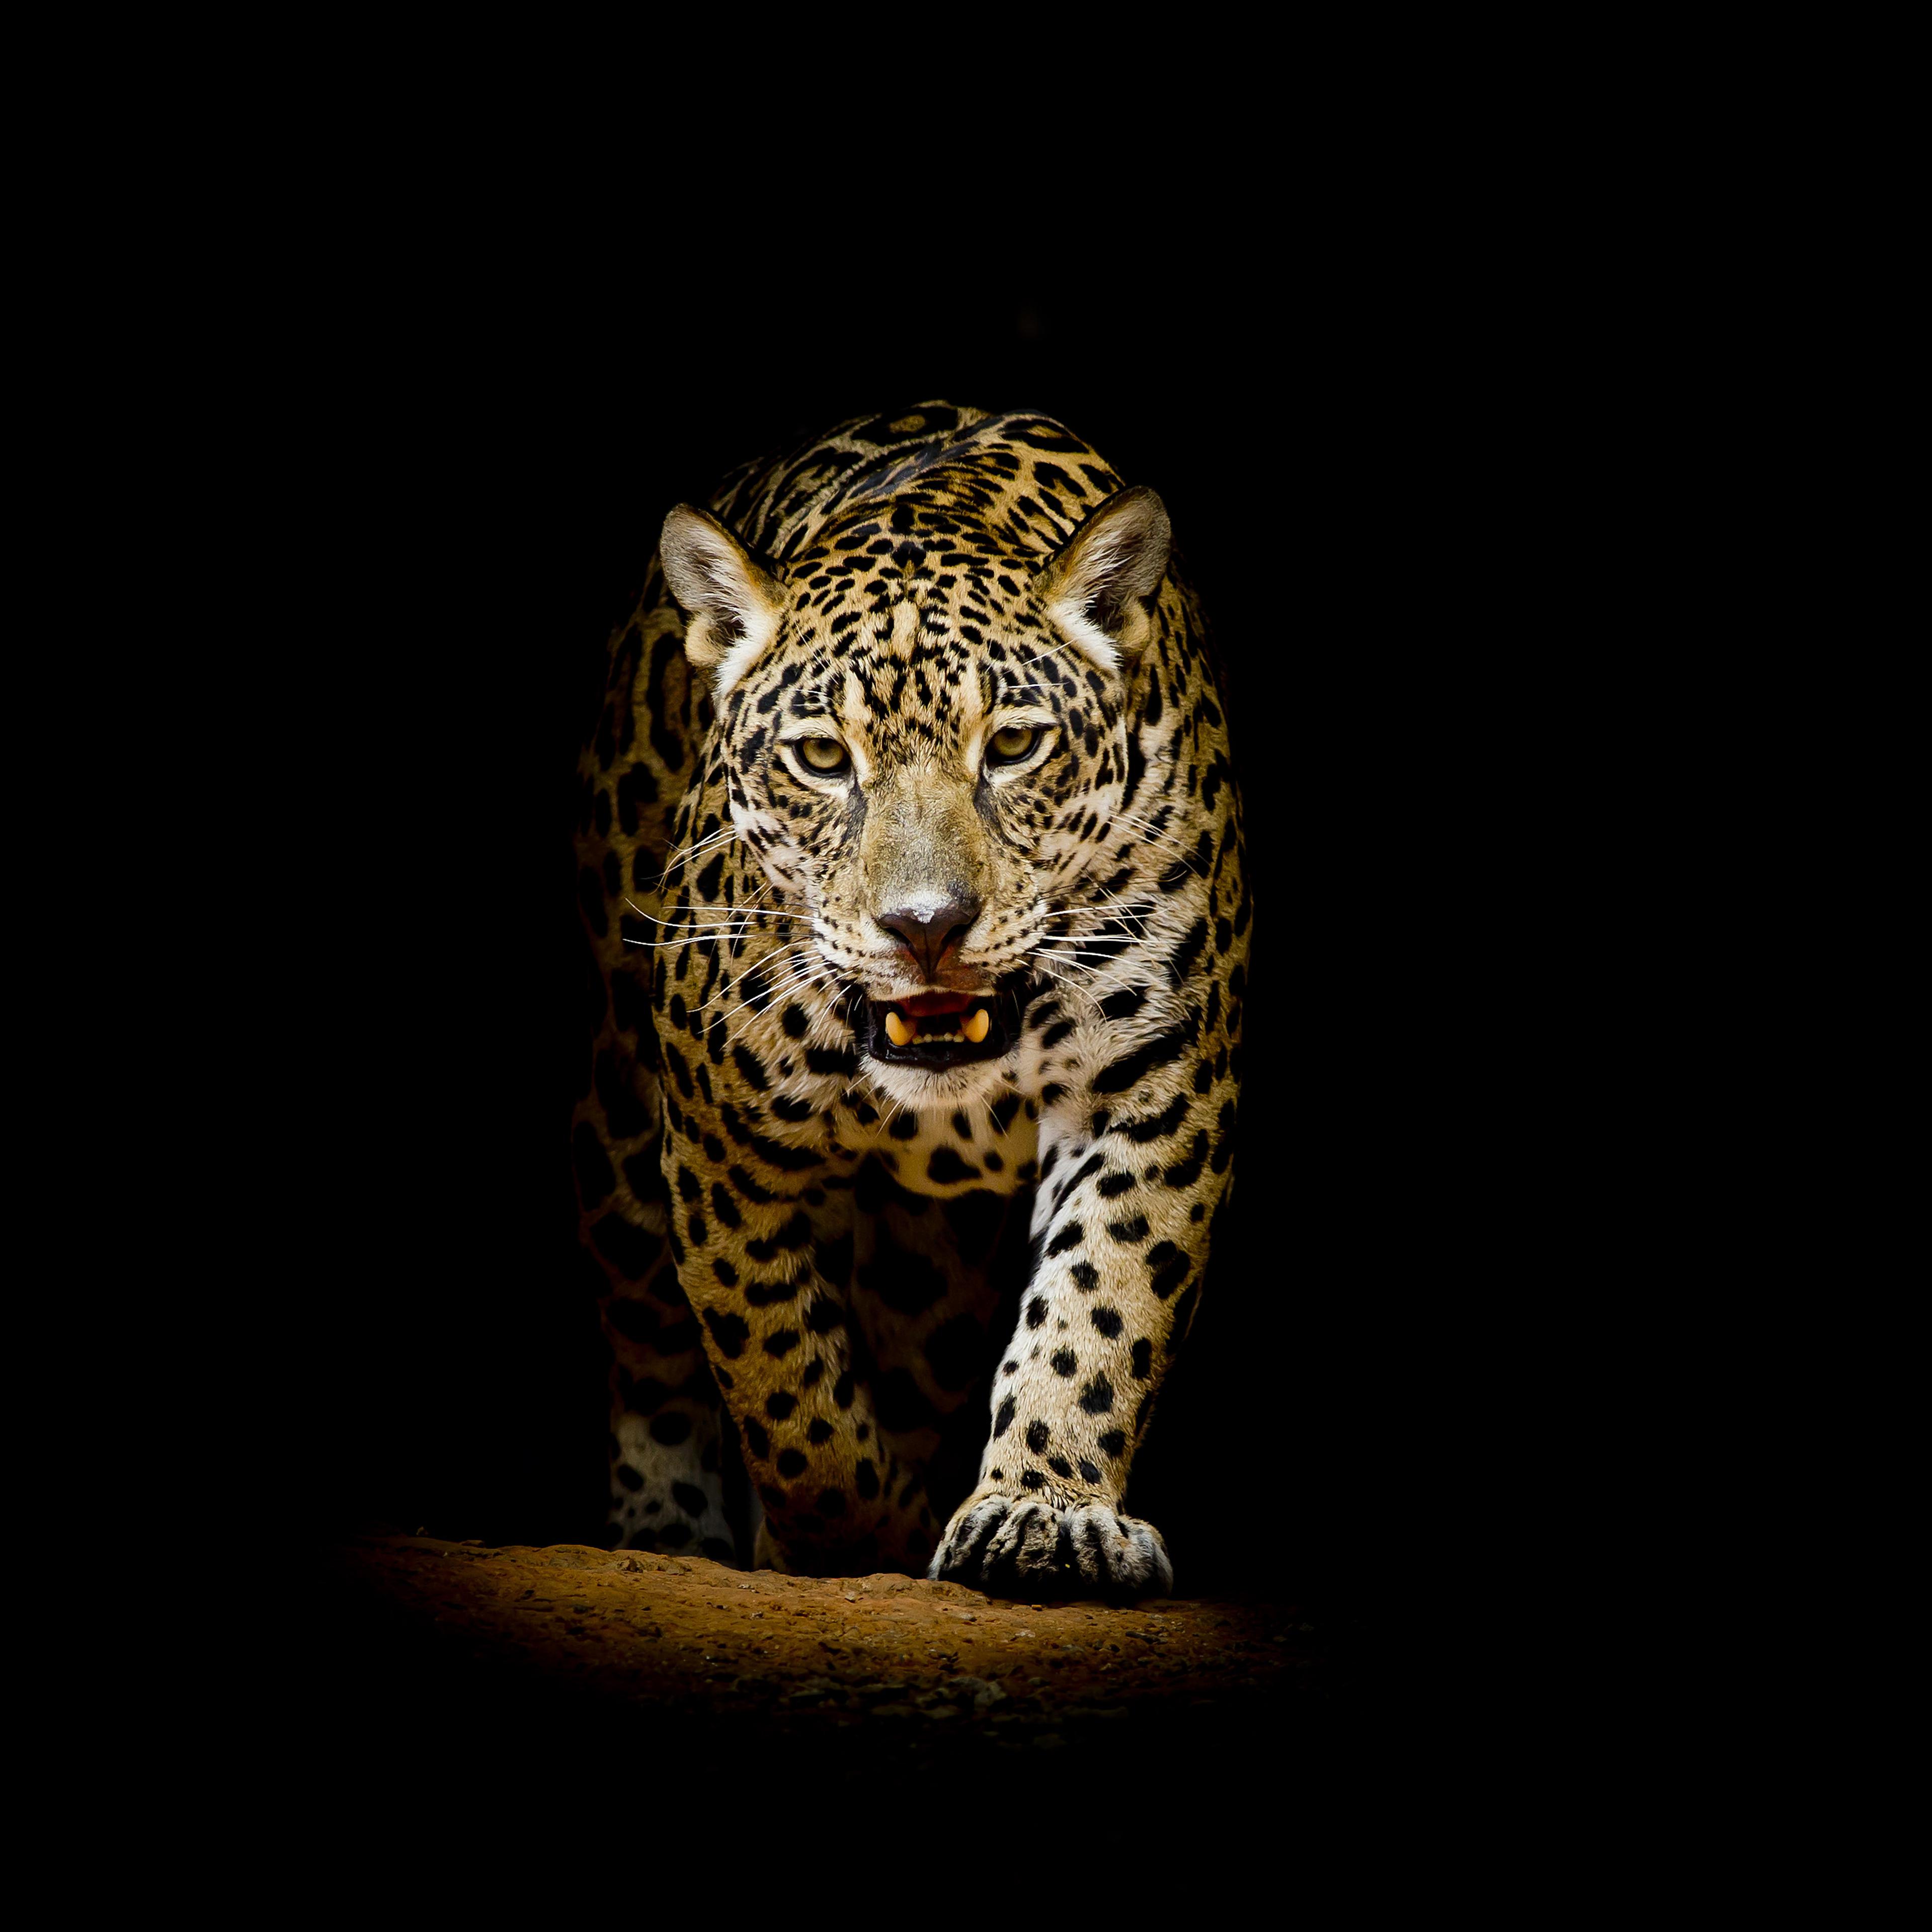 Animals Wallpaper: Leopard 4k Black Background, HD Animals, 4k Wallpapers